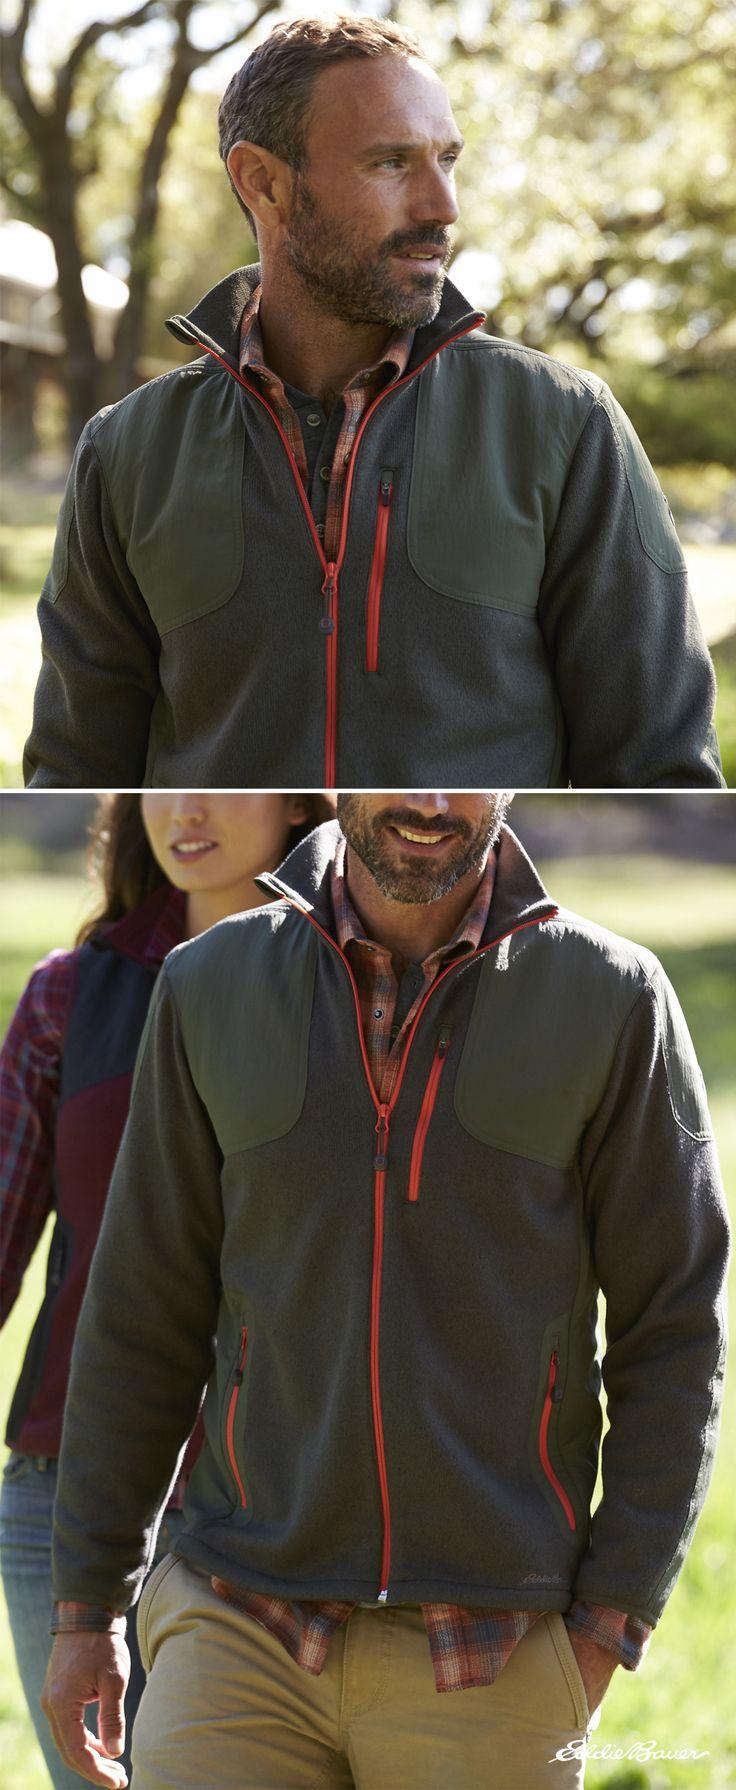 Mens quilted jacket next - The Men S Daybreak Ir Fleece Jacket Next Gen Infrared Technology Keeps You Warmer Longer